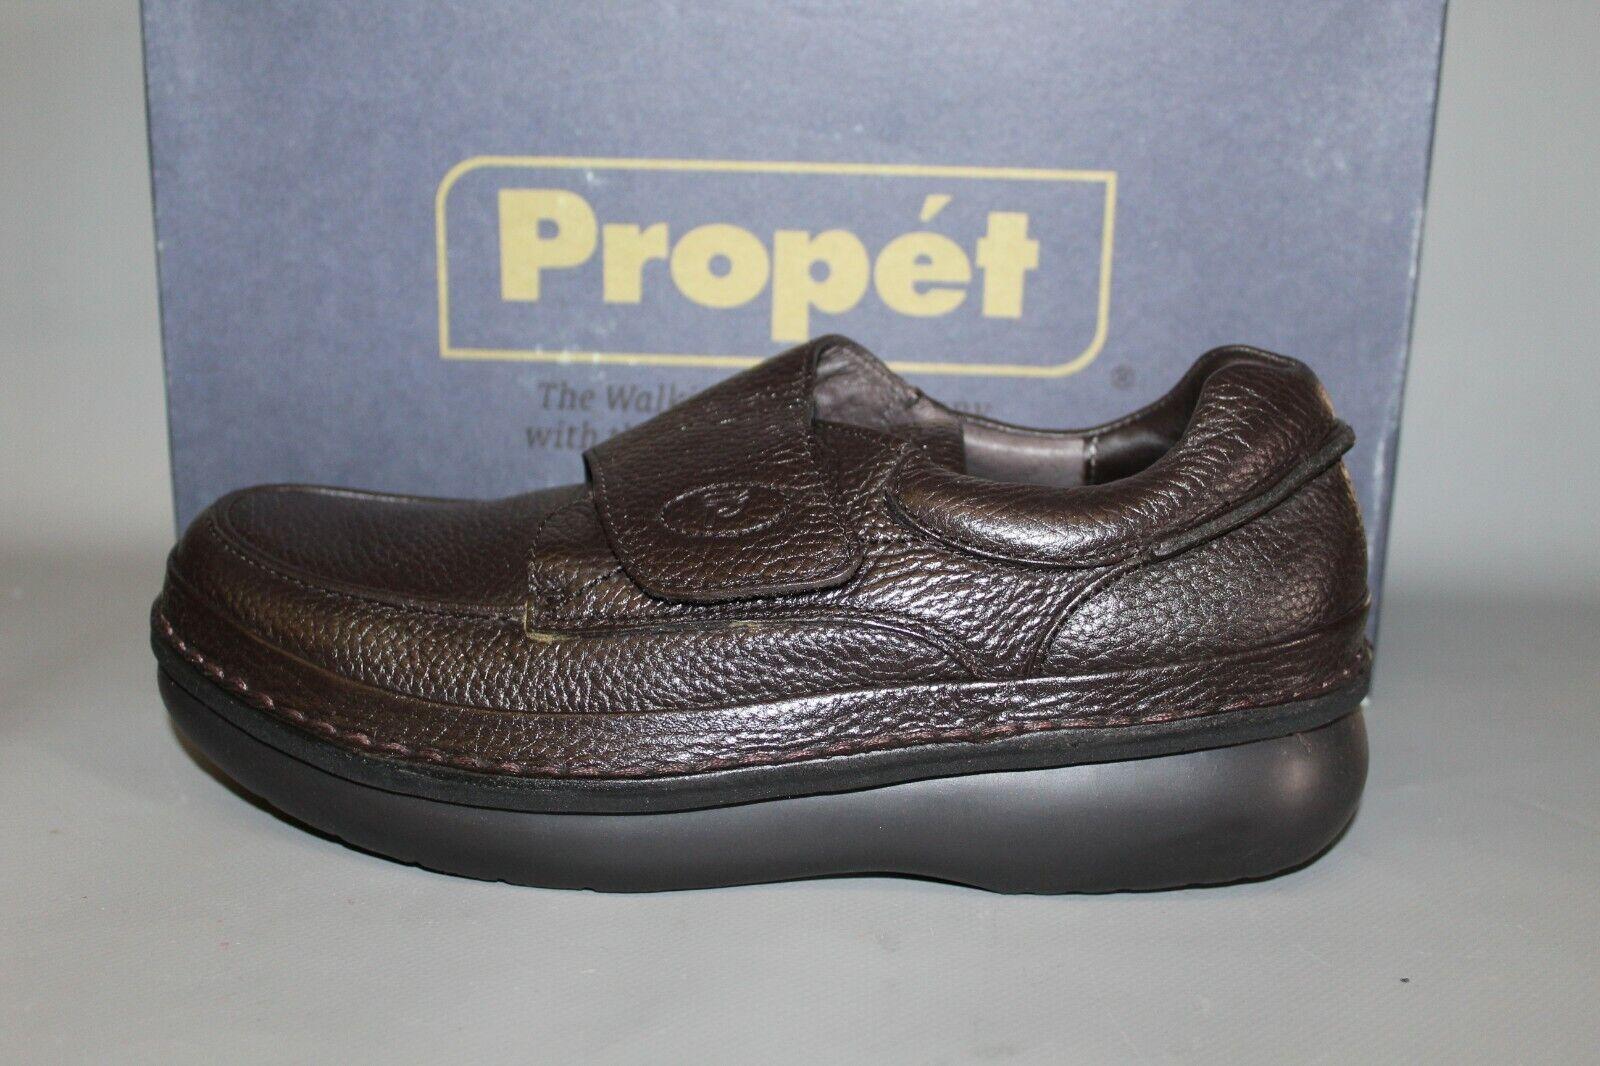 NEW Men's Propet M50155 Dark Brown Hook and Loop Casual Comfortable shoes